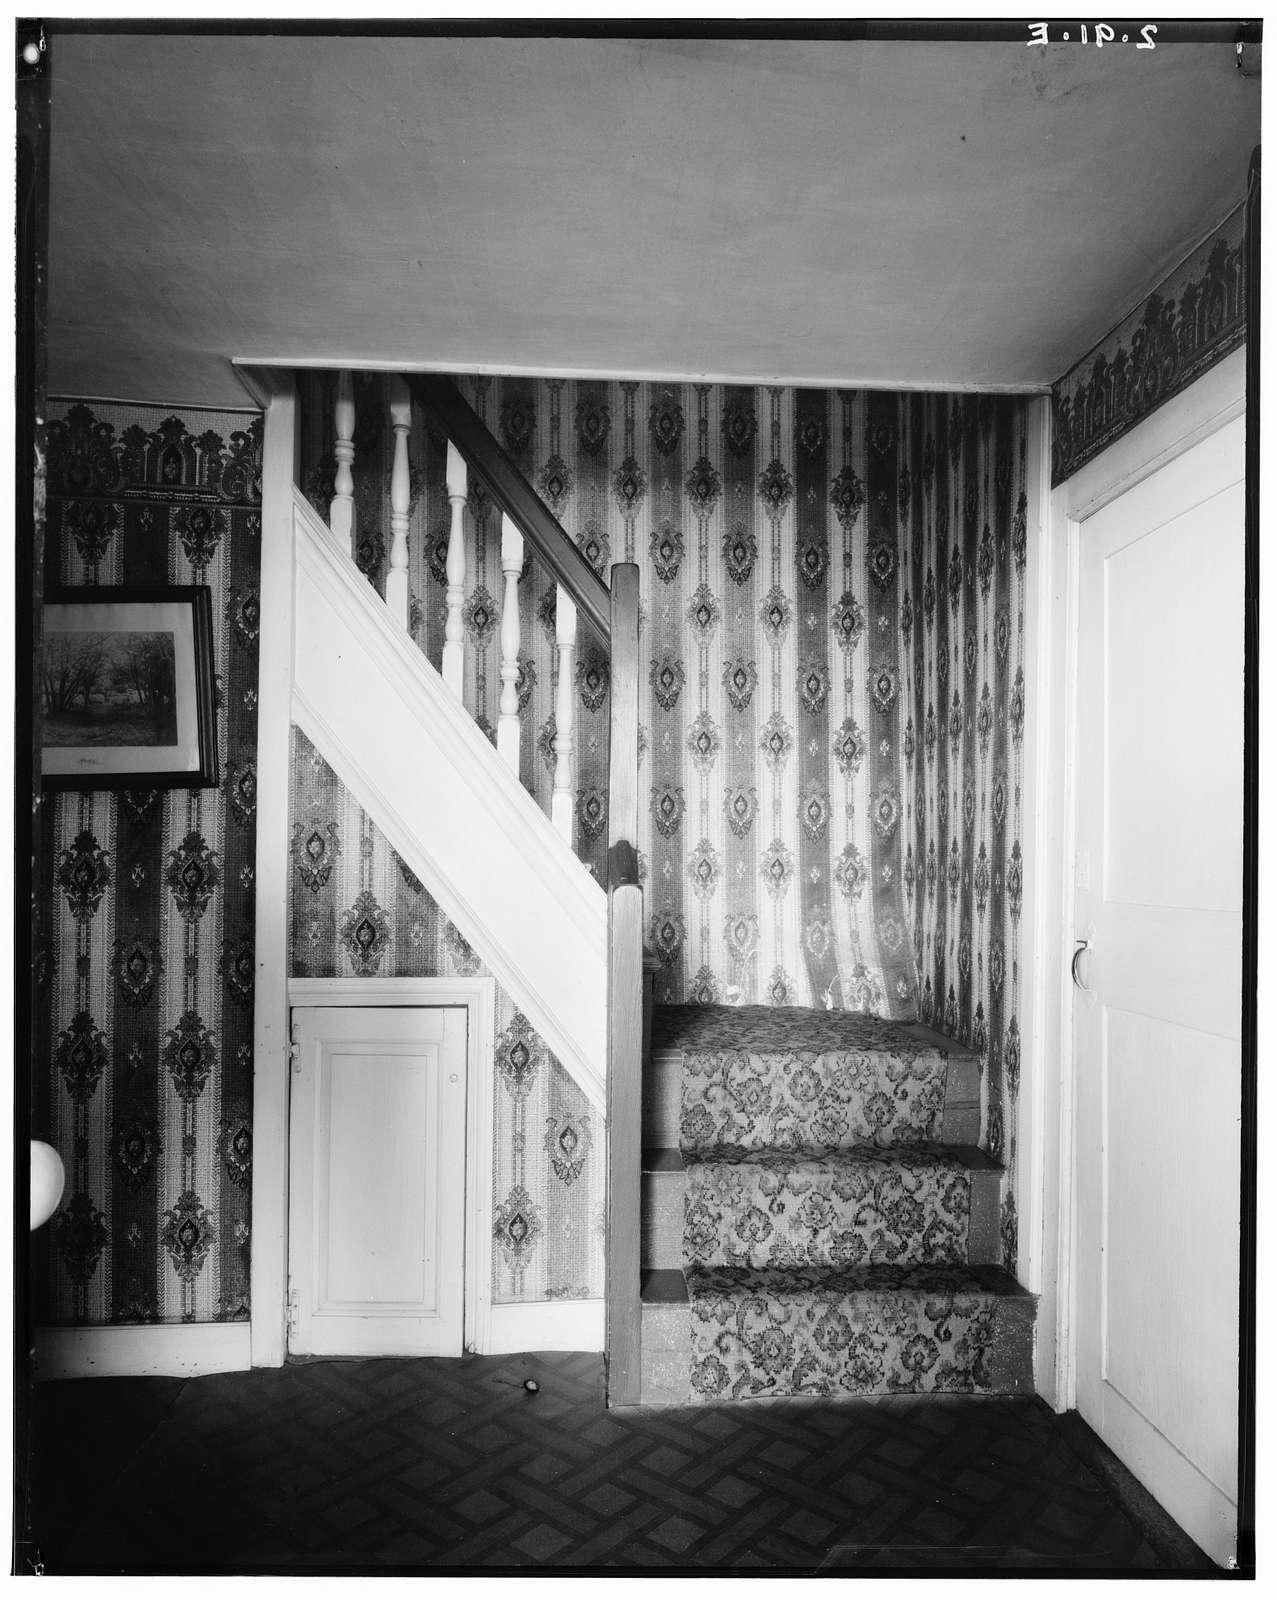 Andrews House, 38 Walnut Street, Bridgewater, Plymouth County, MA